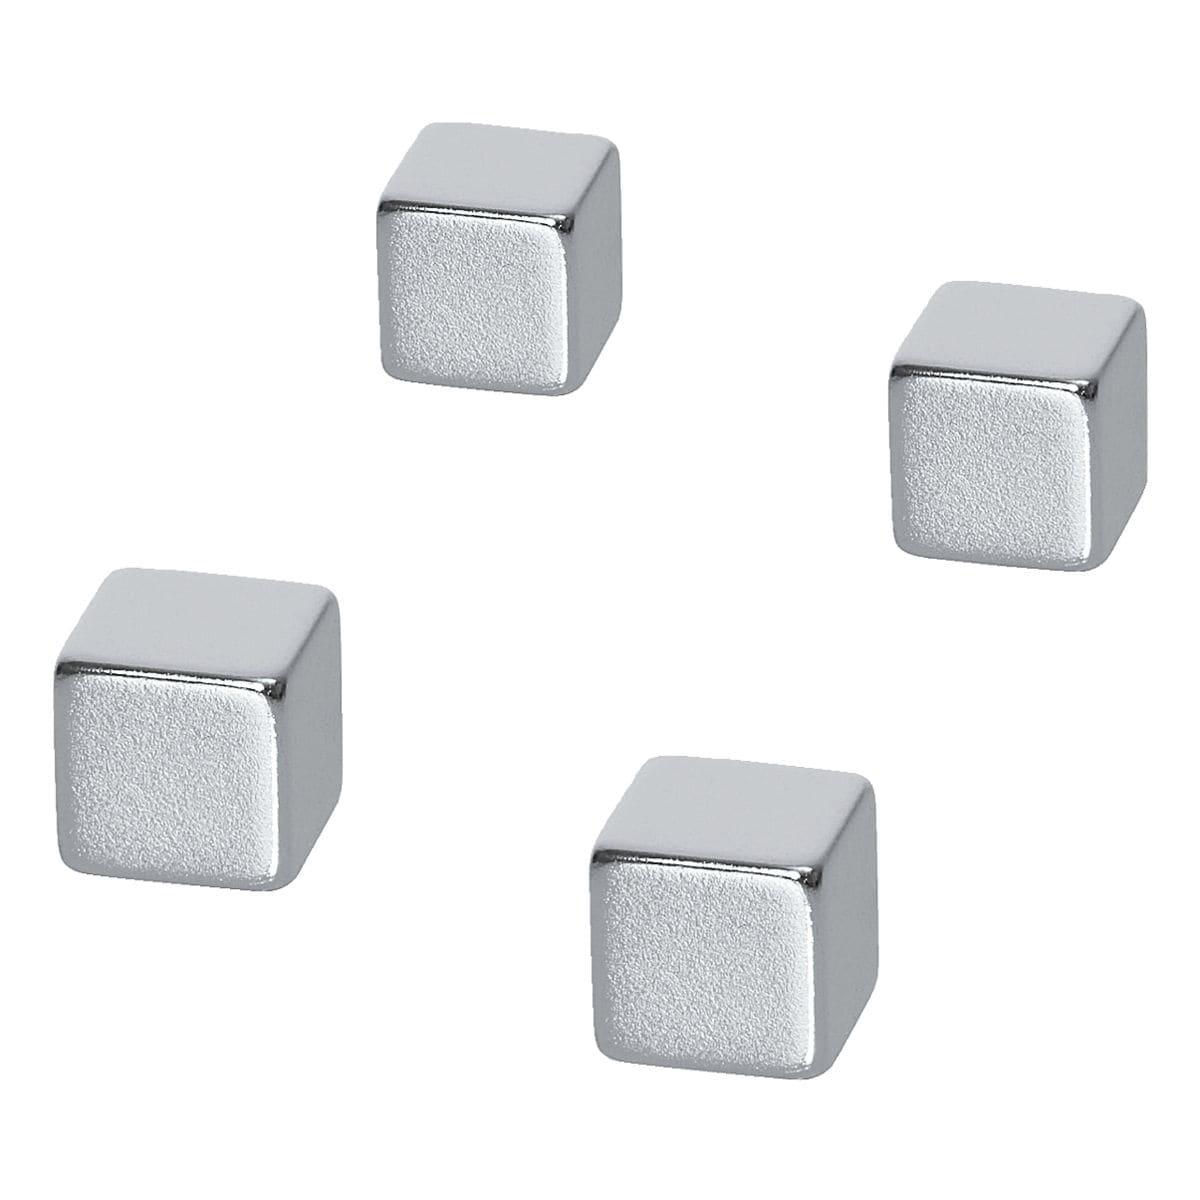 be board 4er set neodym magnete cube b3100 bei otto office g nstig kaufen. Black Bedroom Furniture Sets. Home Design Ideas